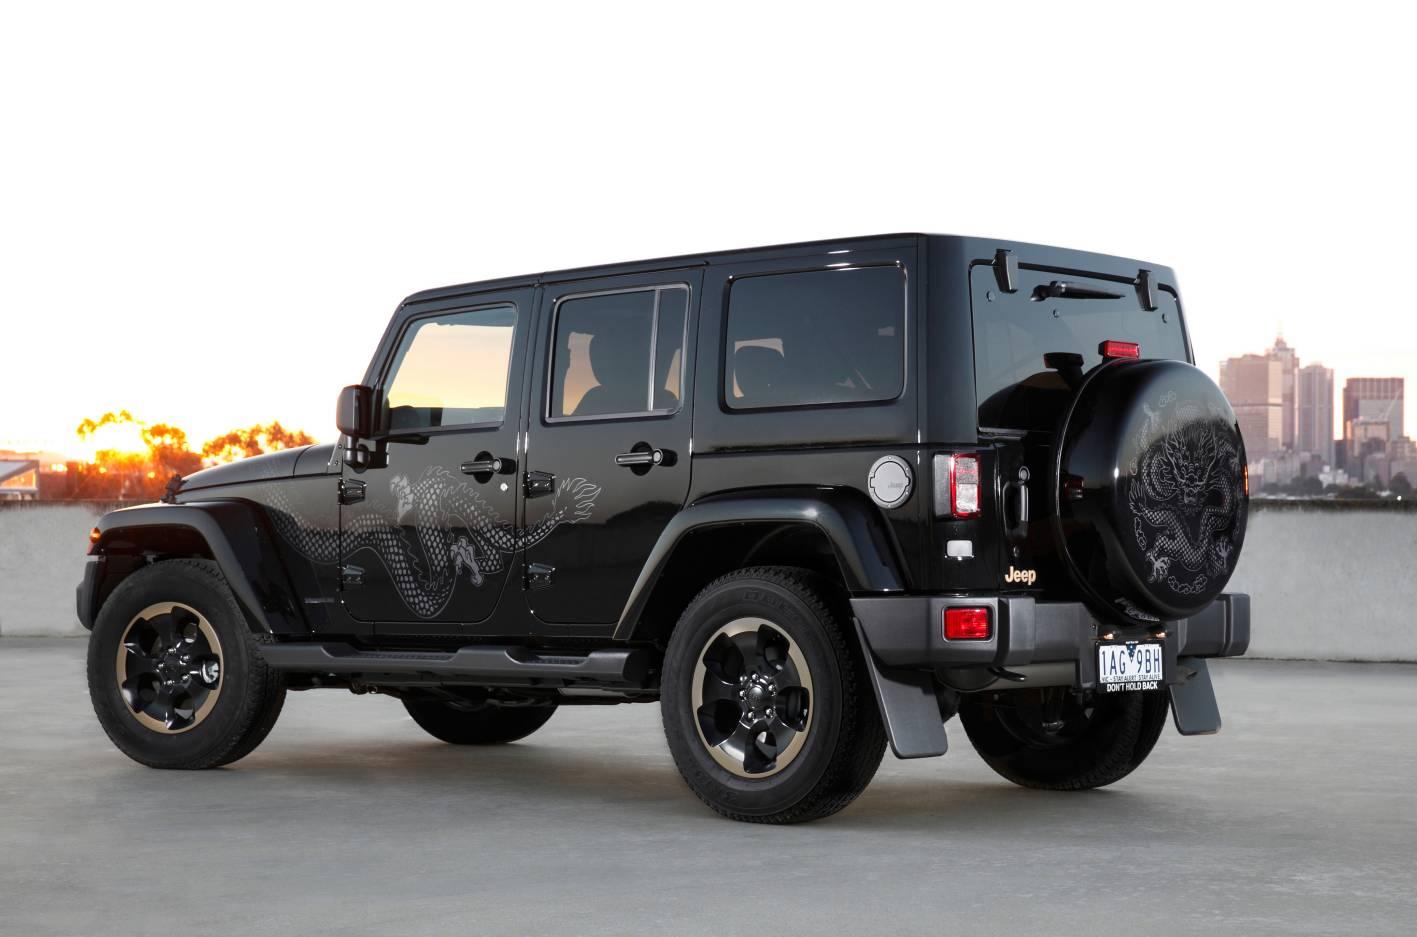 2014 jeep wrangler dragon edition on sale from 51 000 performancedrive. Black Bedroom Furniture Sets. Home Design Ideas